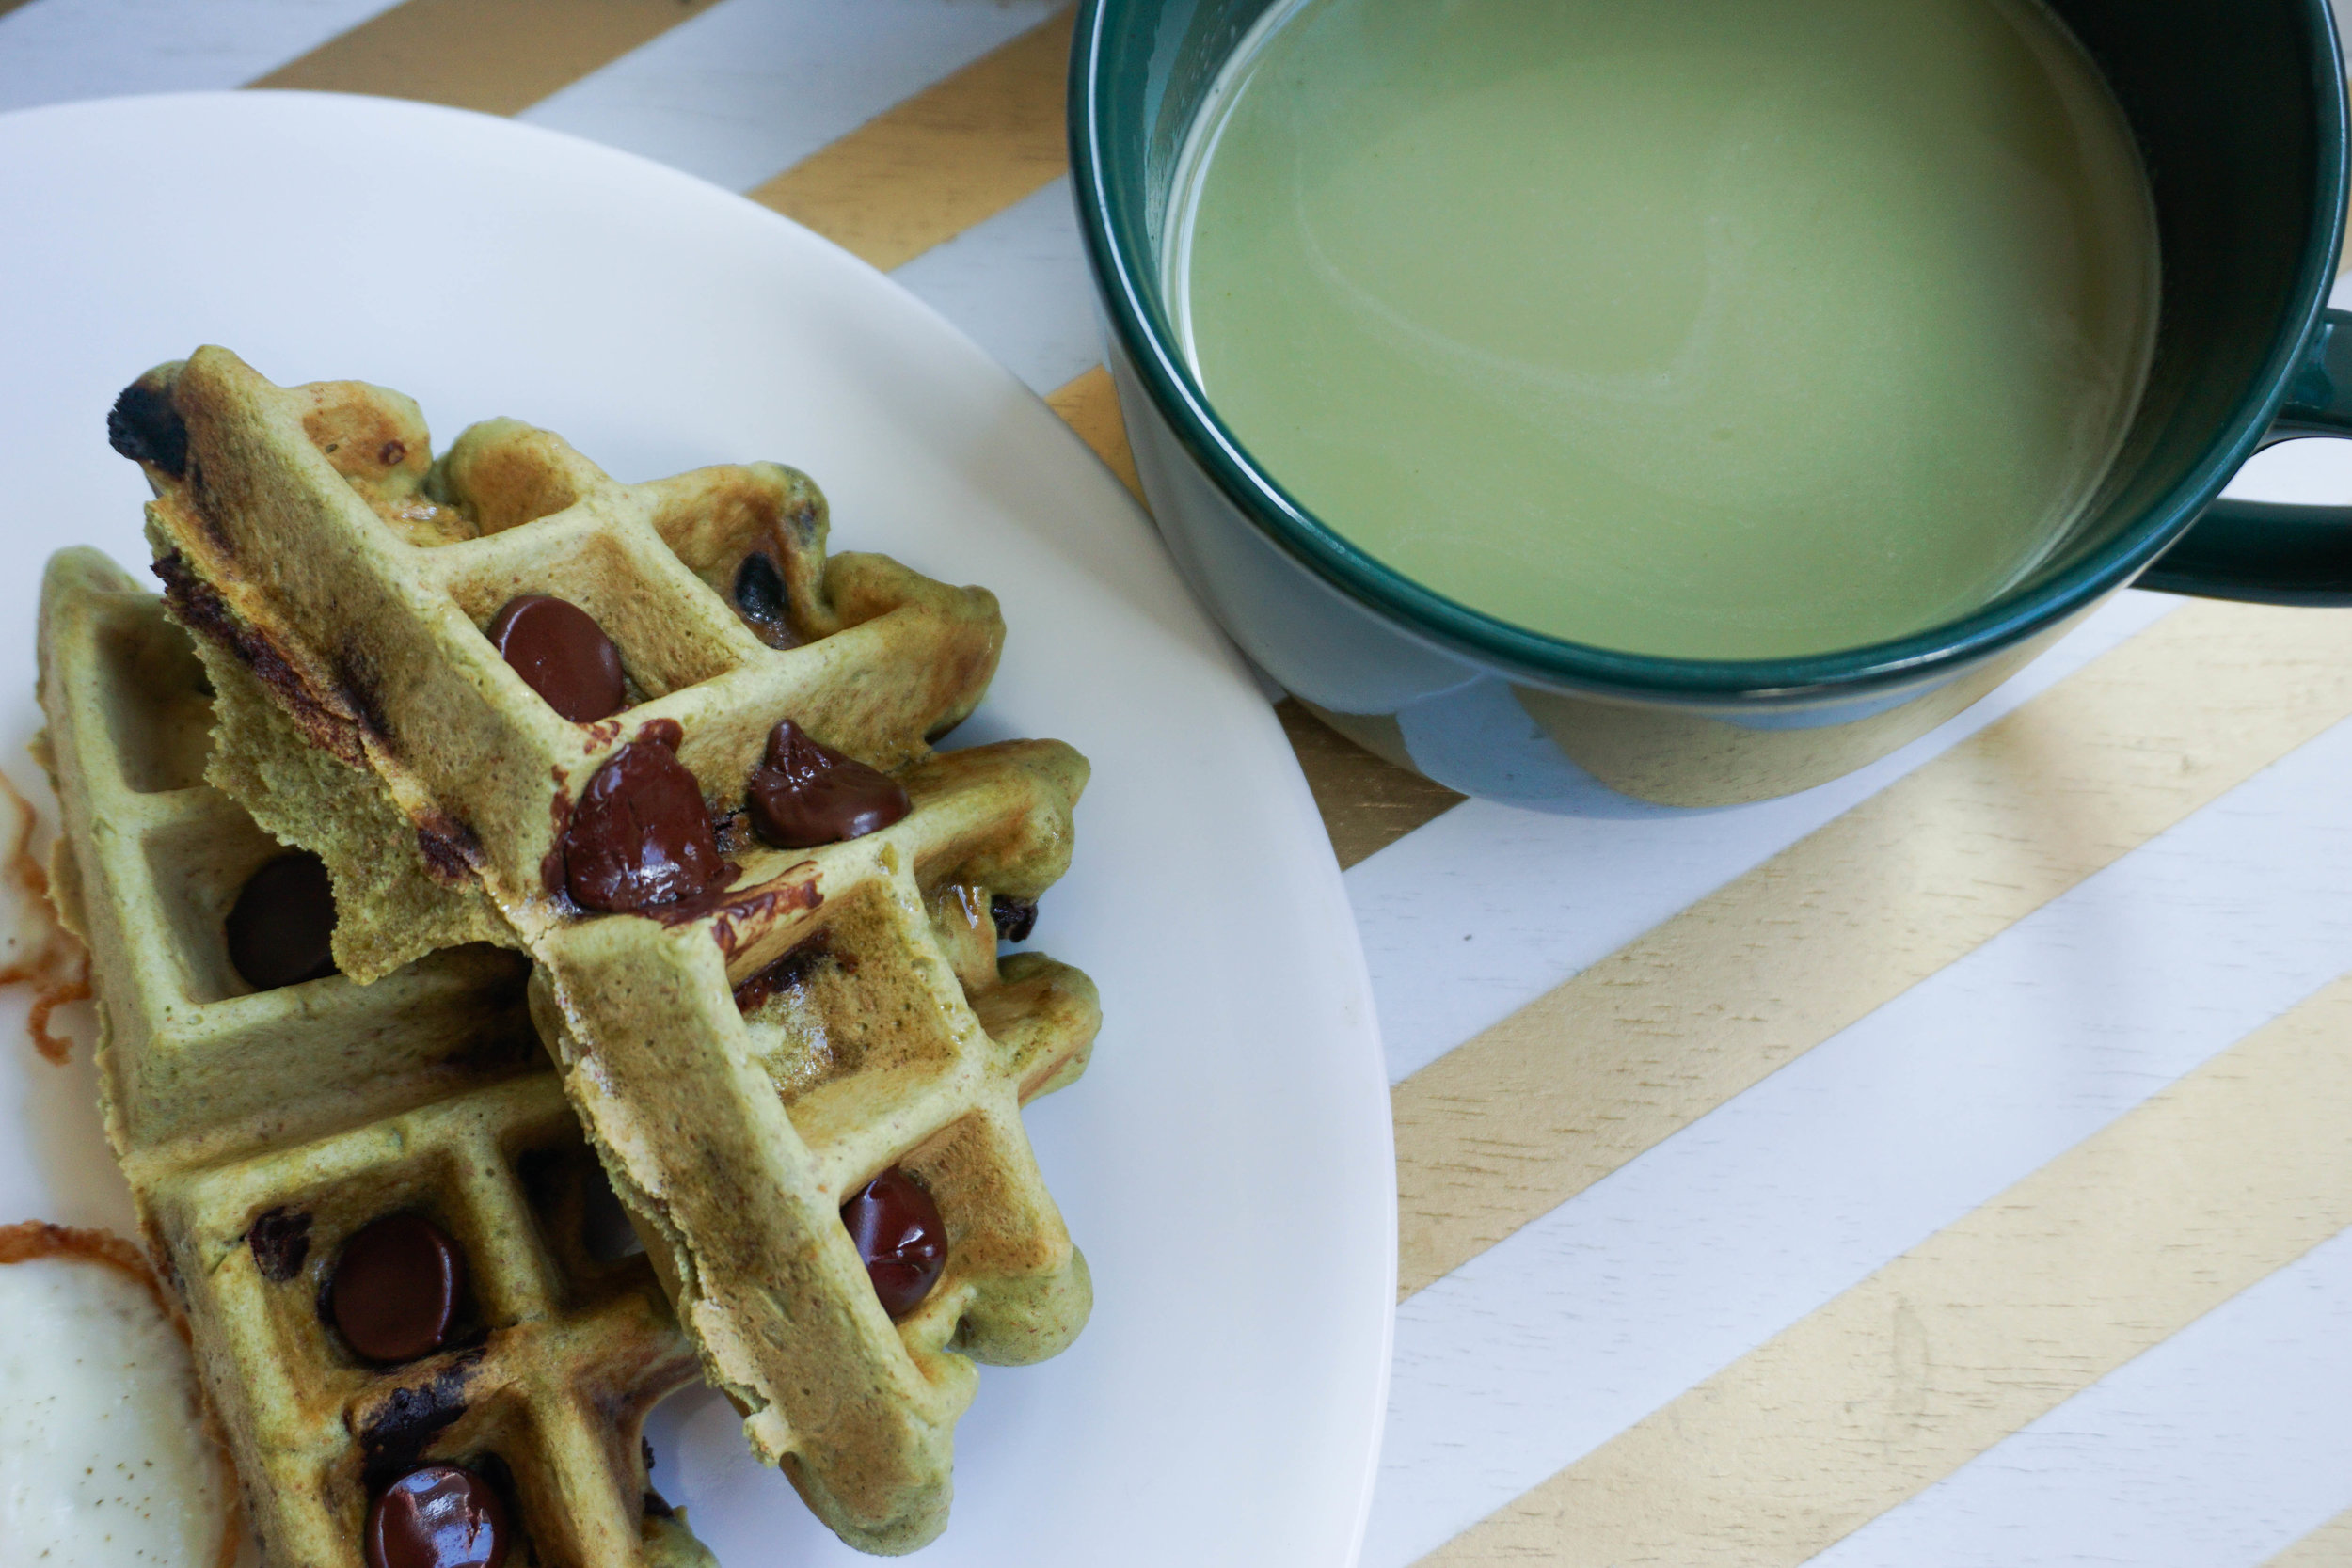 I got wild and had a matcha latte with my matcha waffles. OVERLOAD!